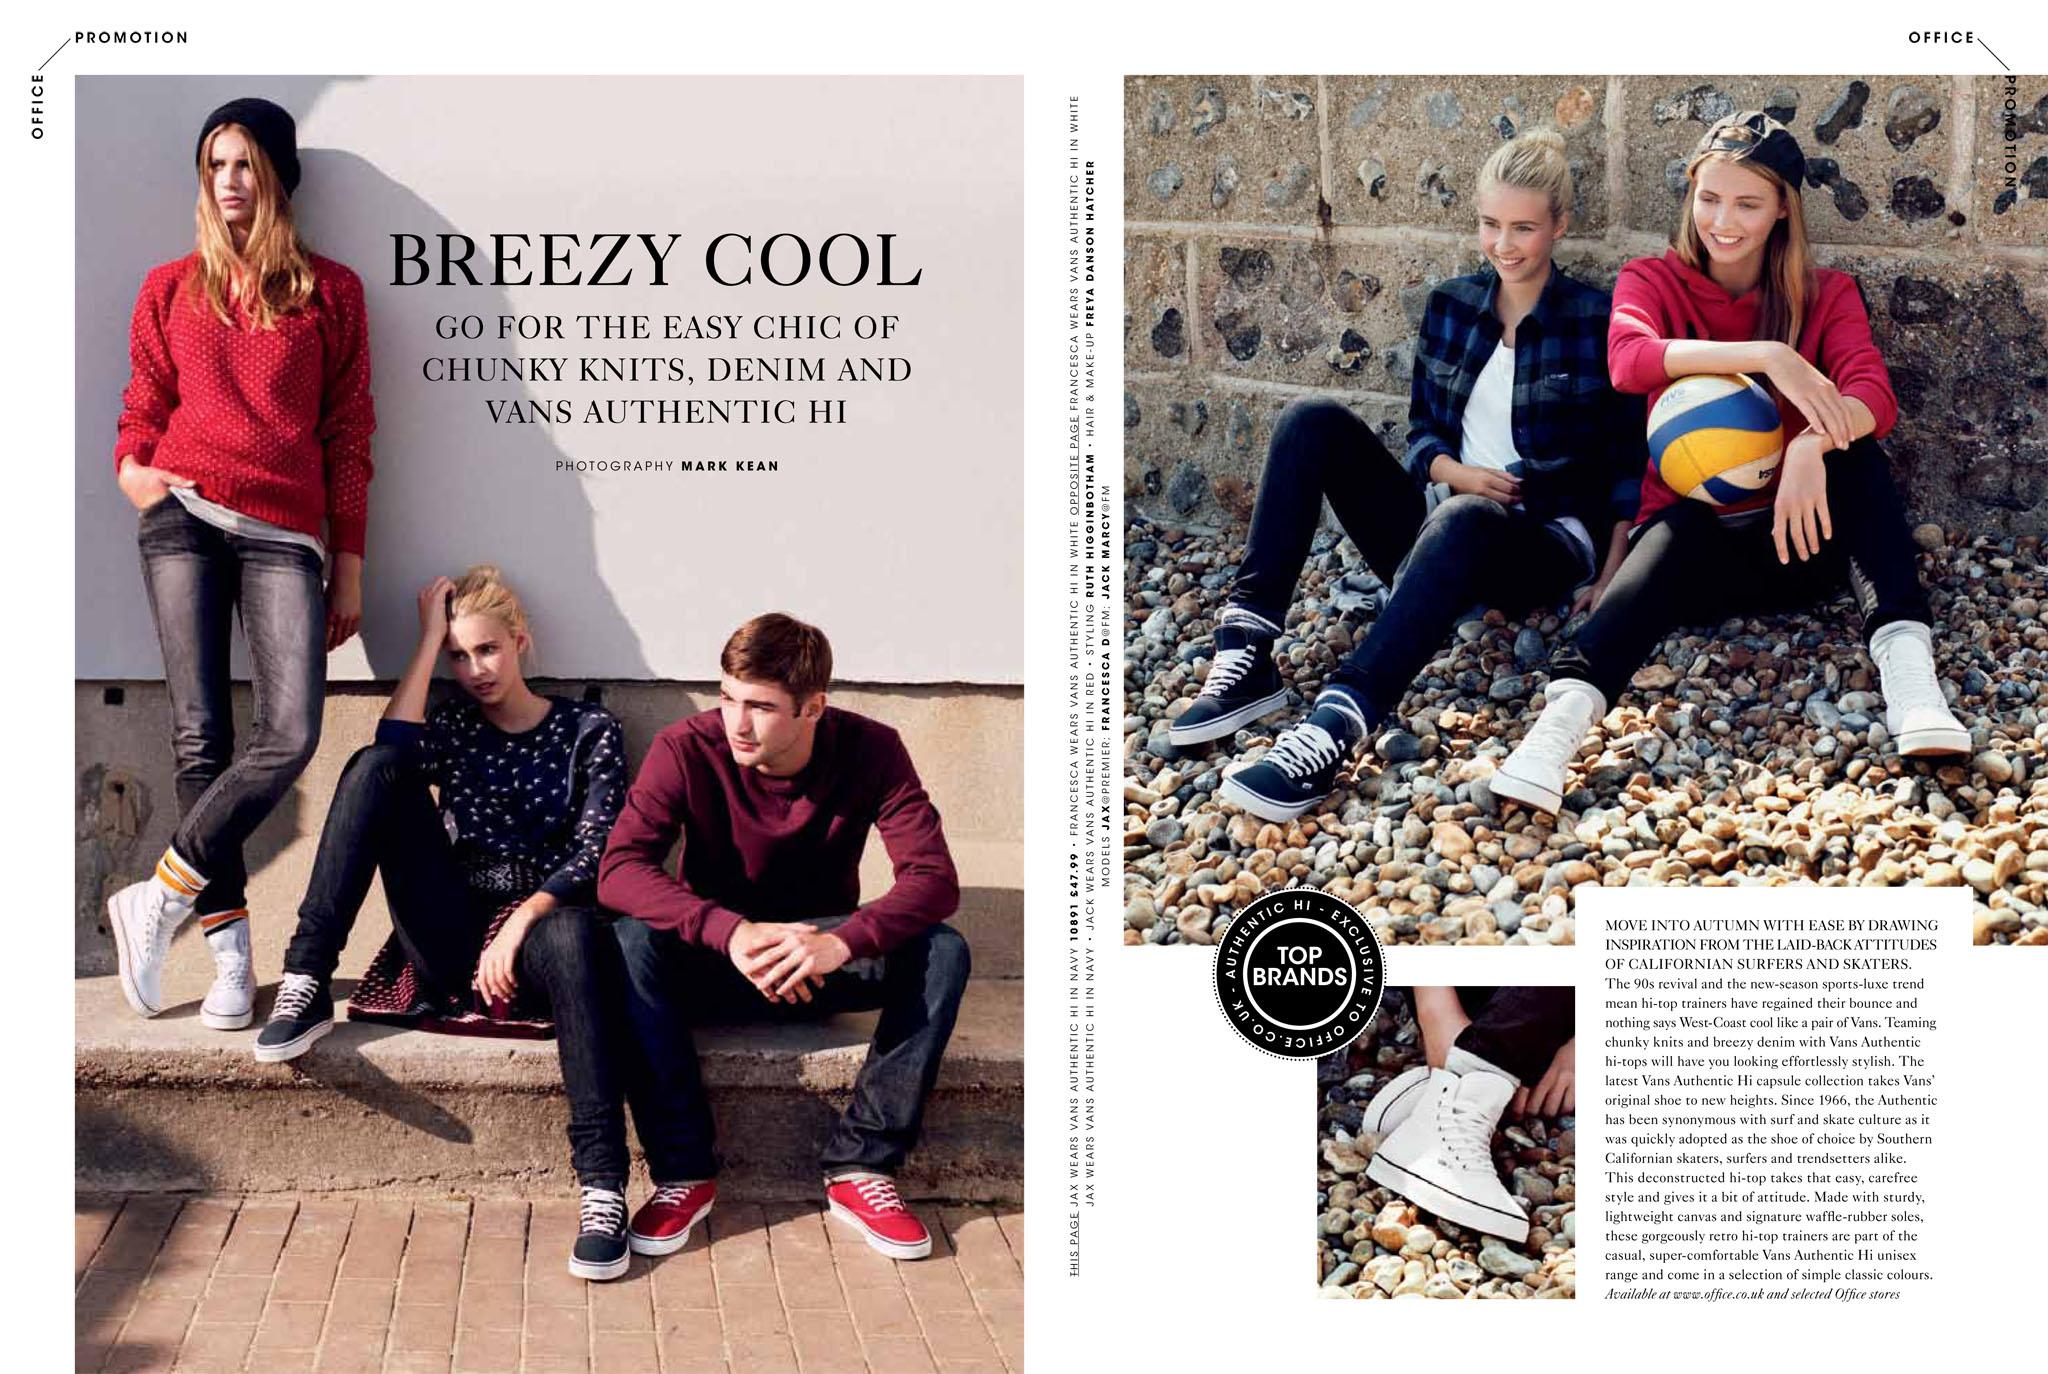 Breezy Cool